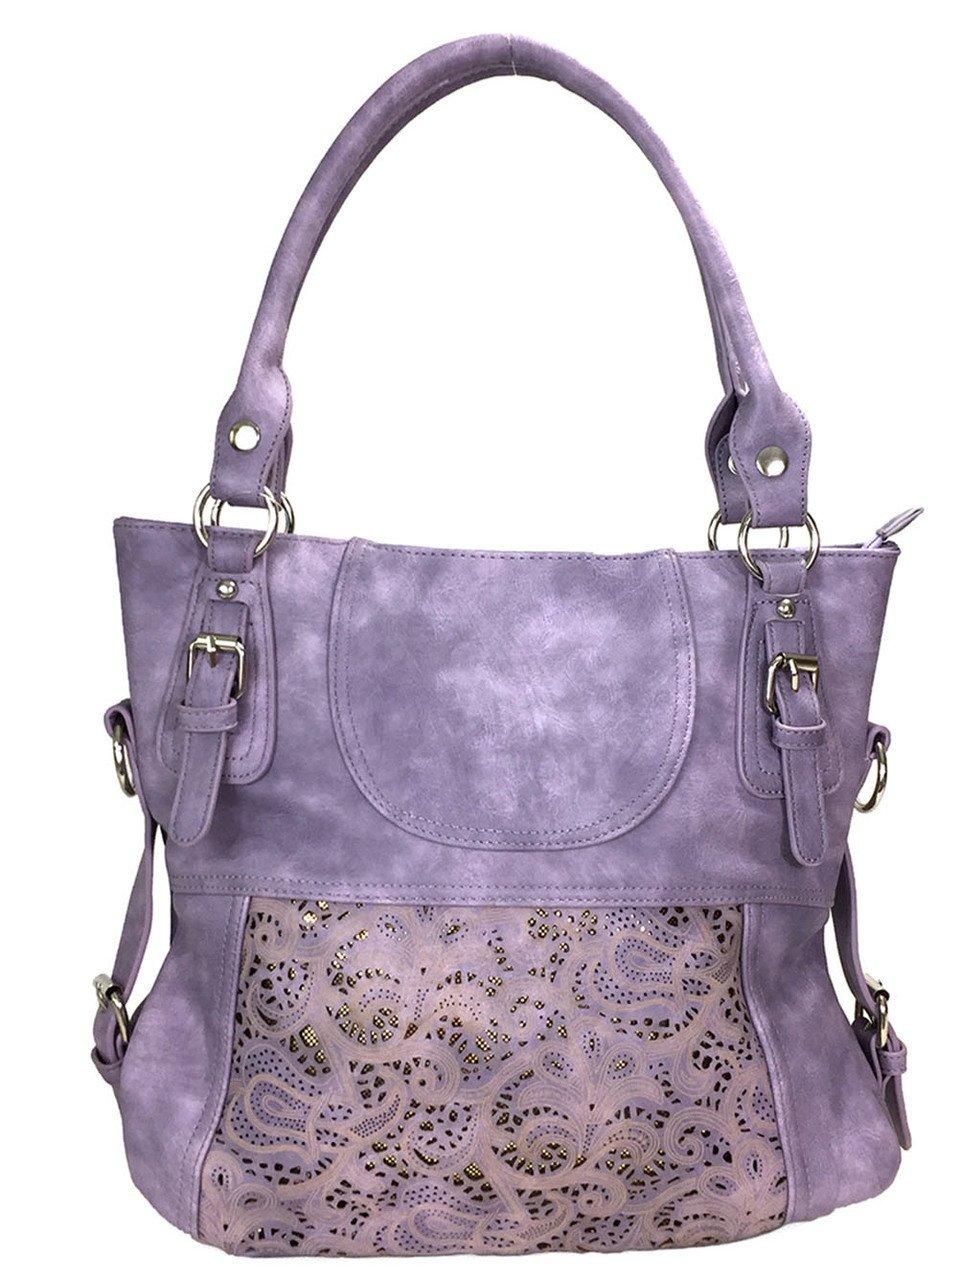 Zzfab Laser Cut Hobo Bag Double Handles Big Purple Purse